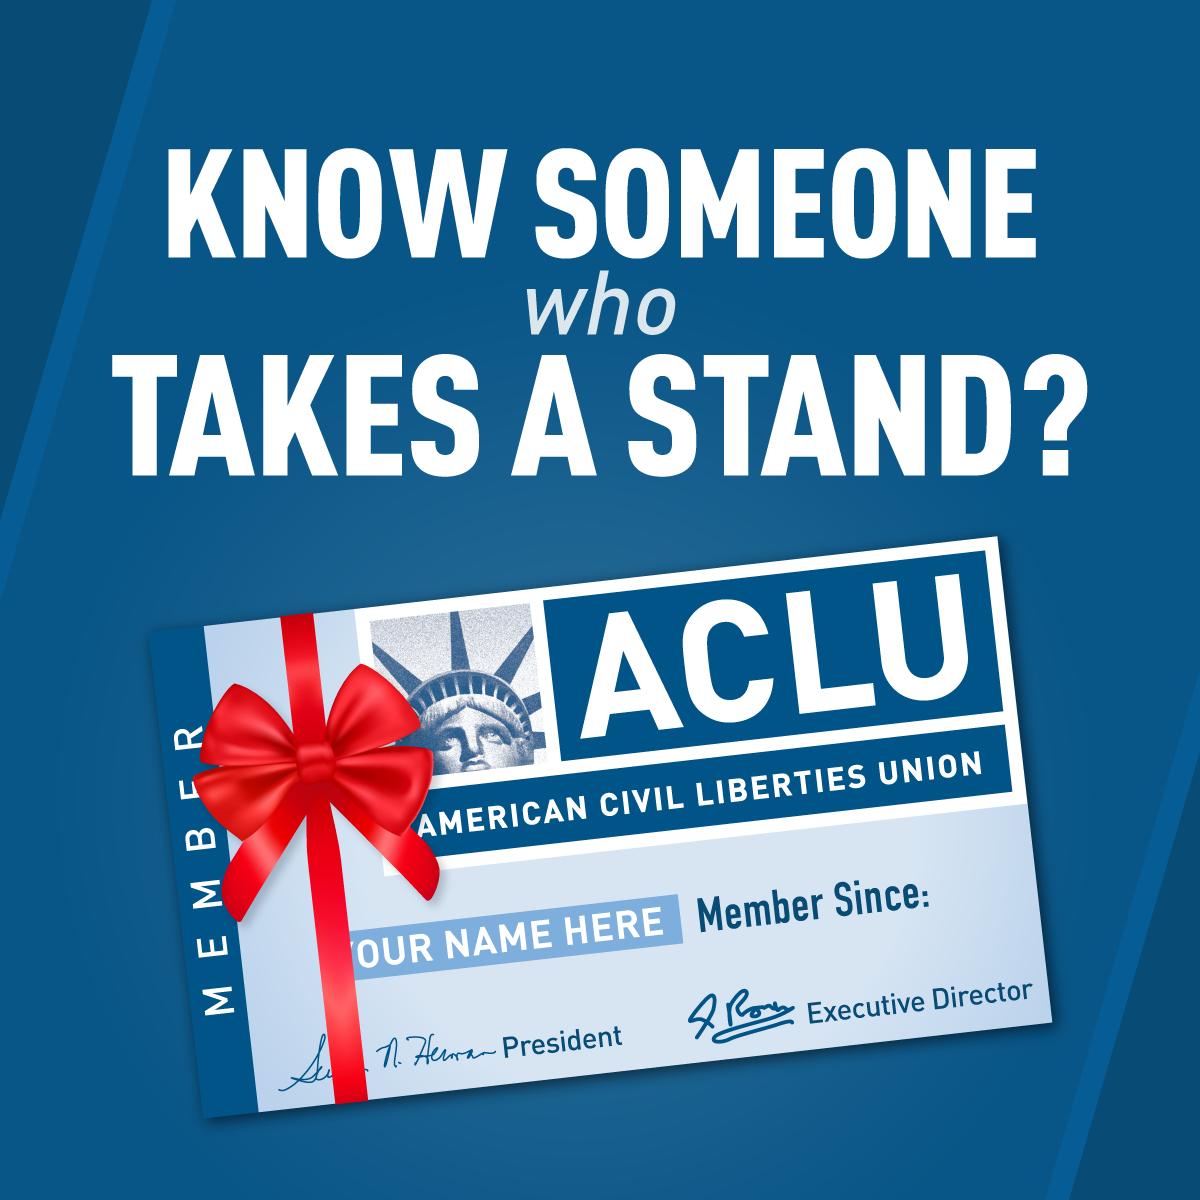 ACLUVerified account